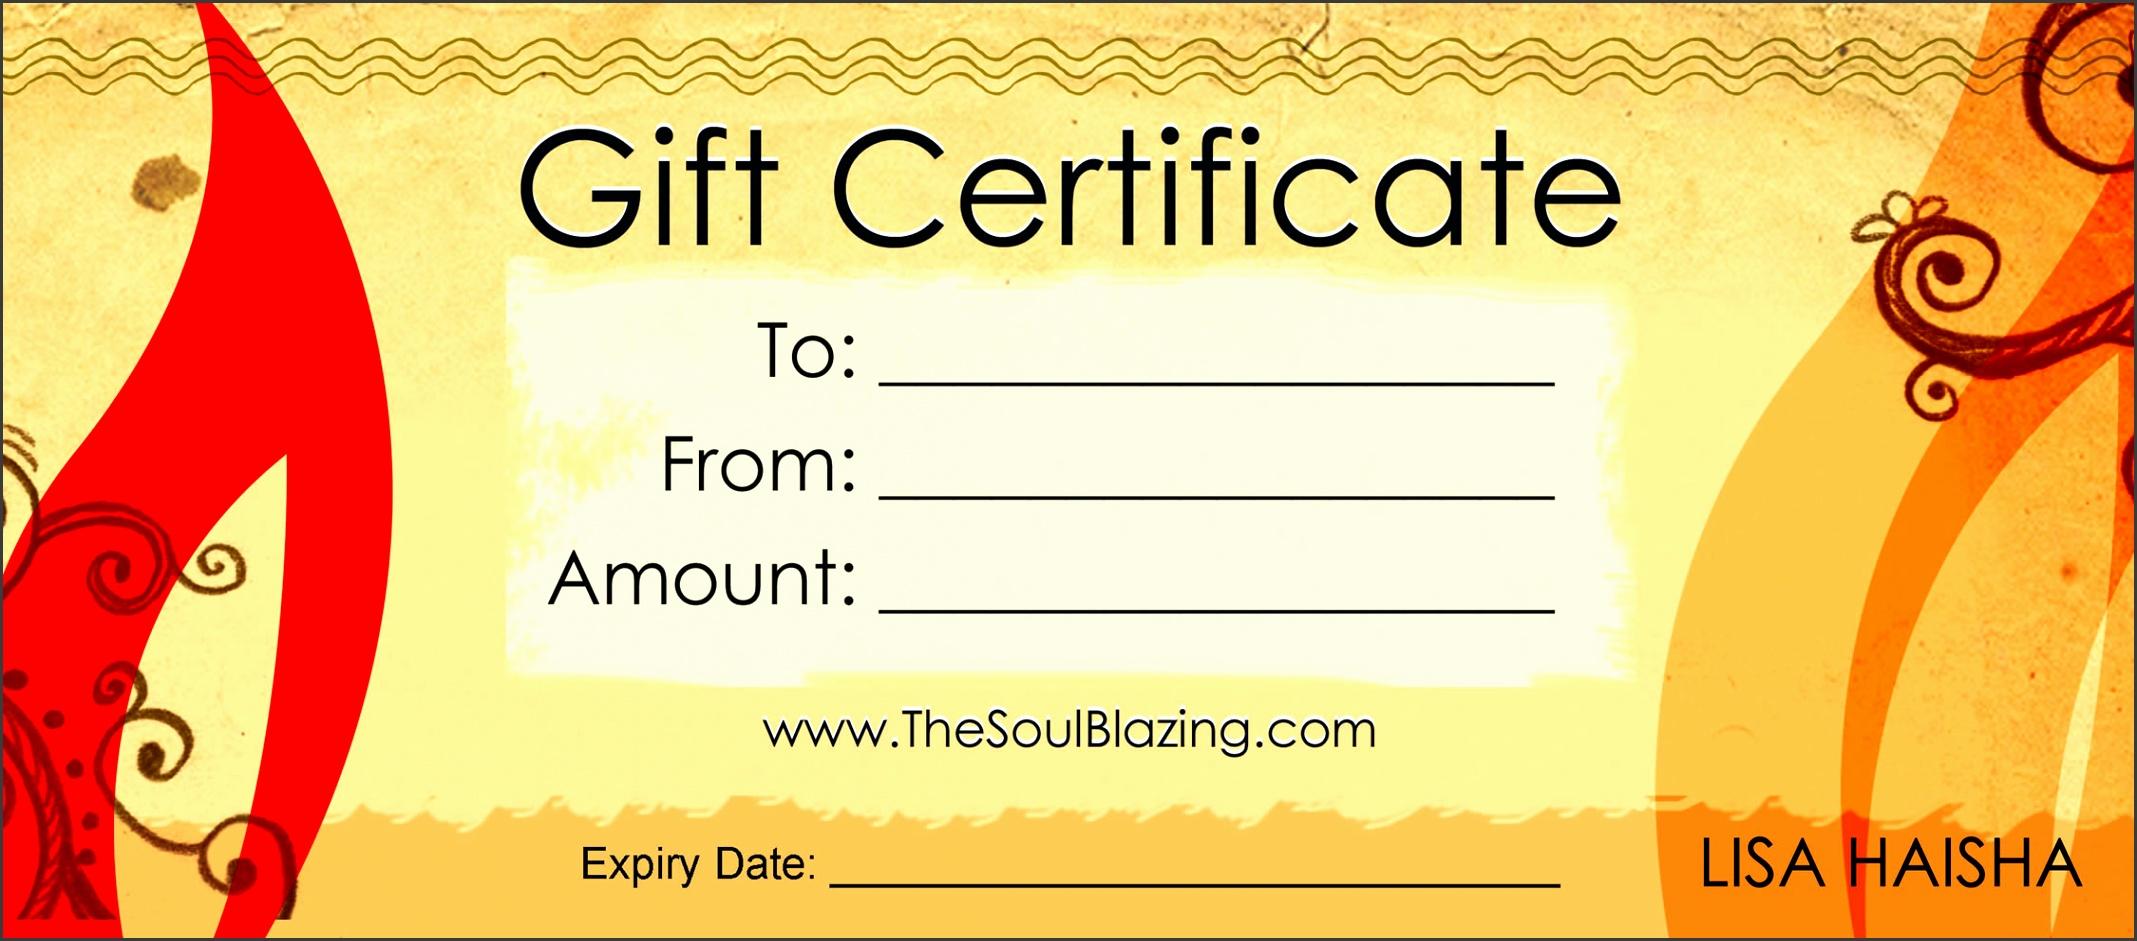 Gift Certificates Gift Certificates · Gift Certificates